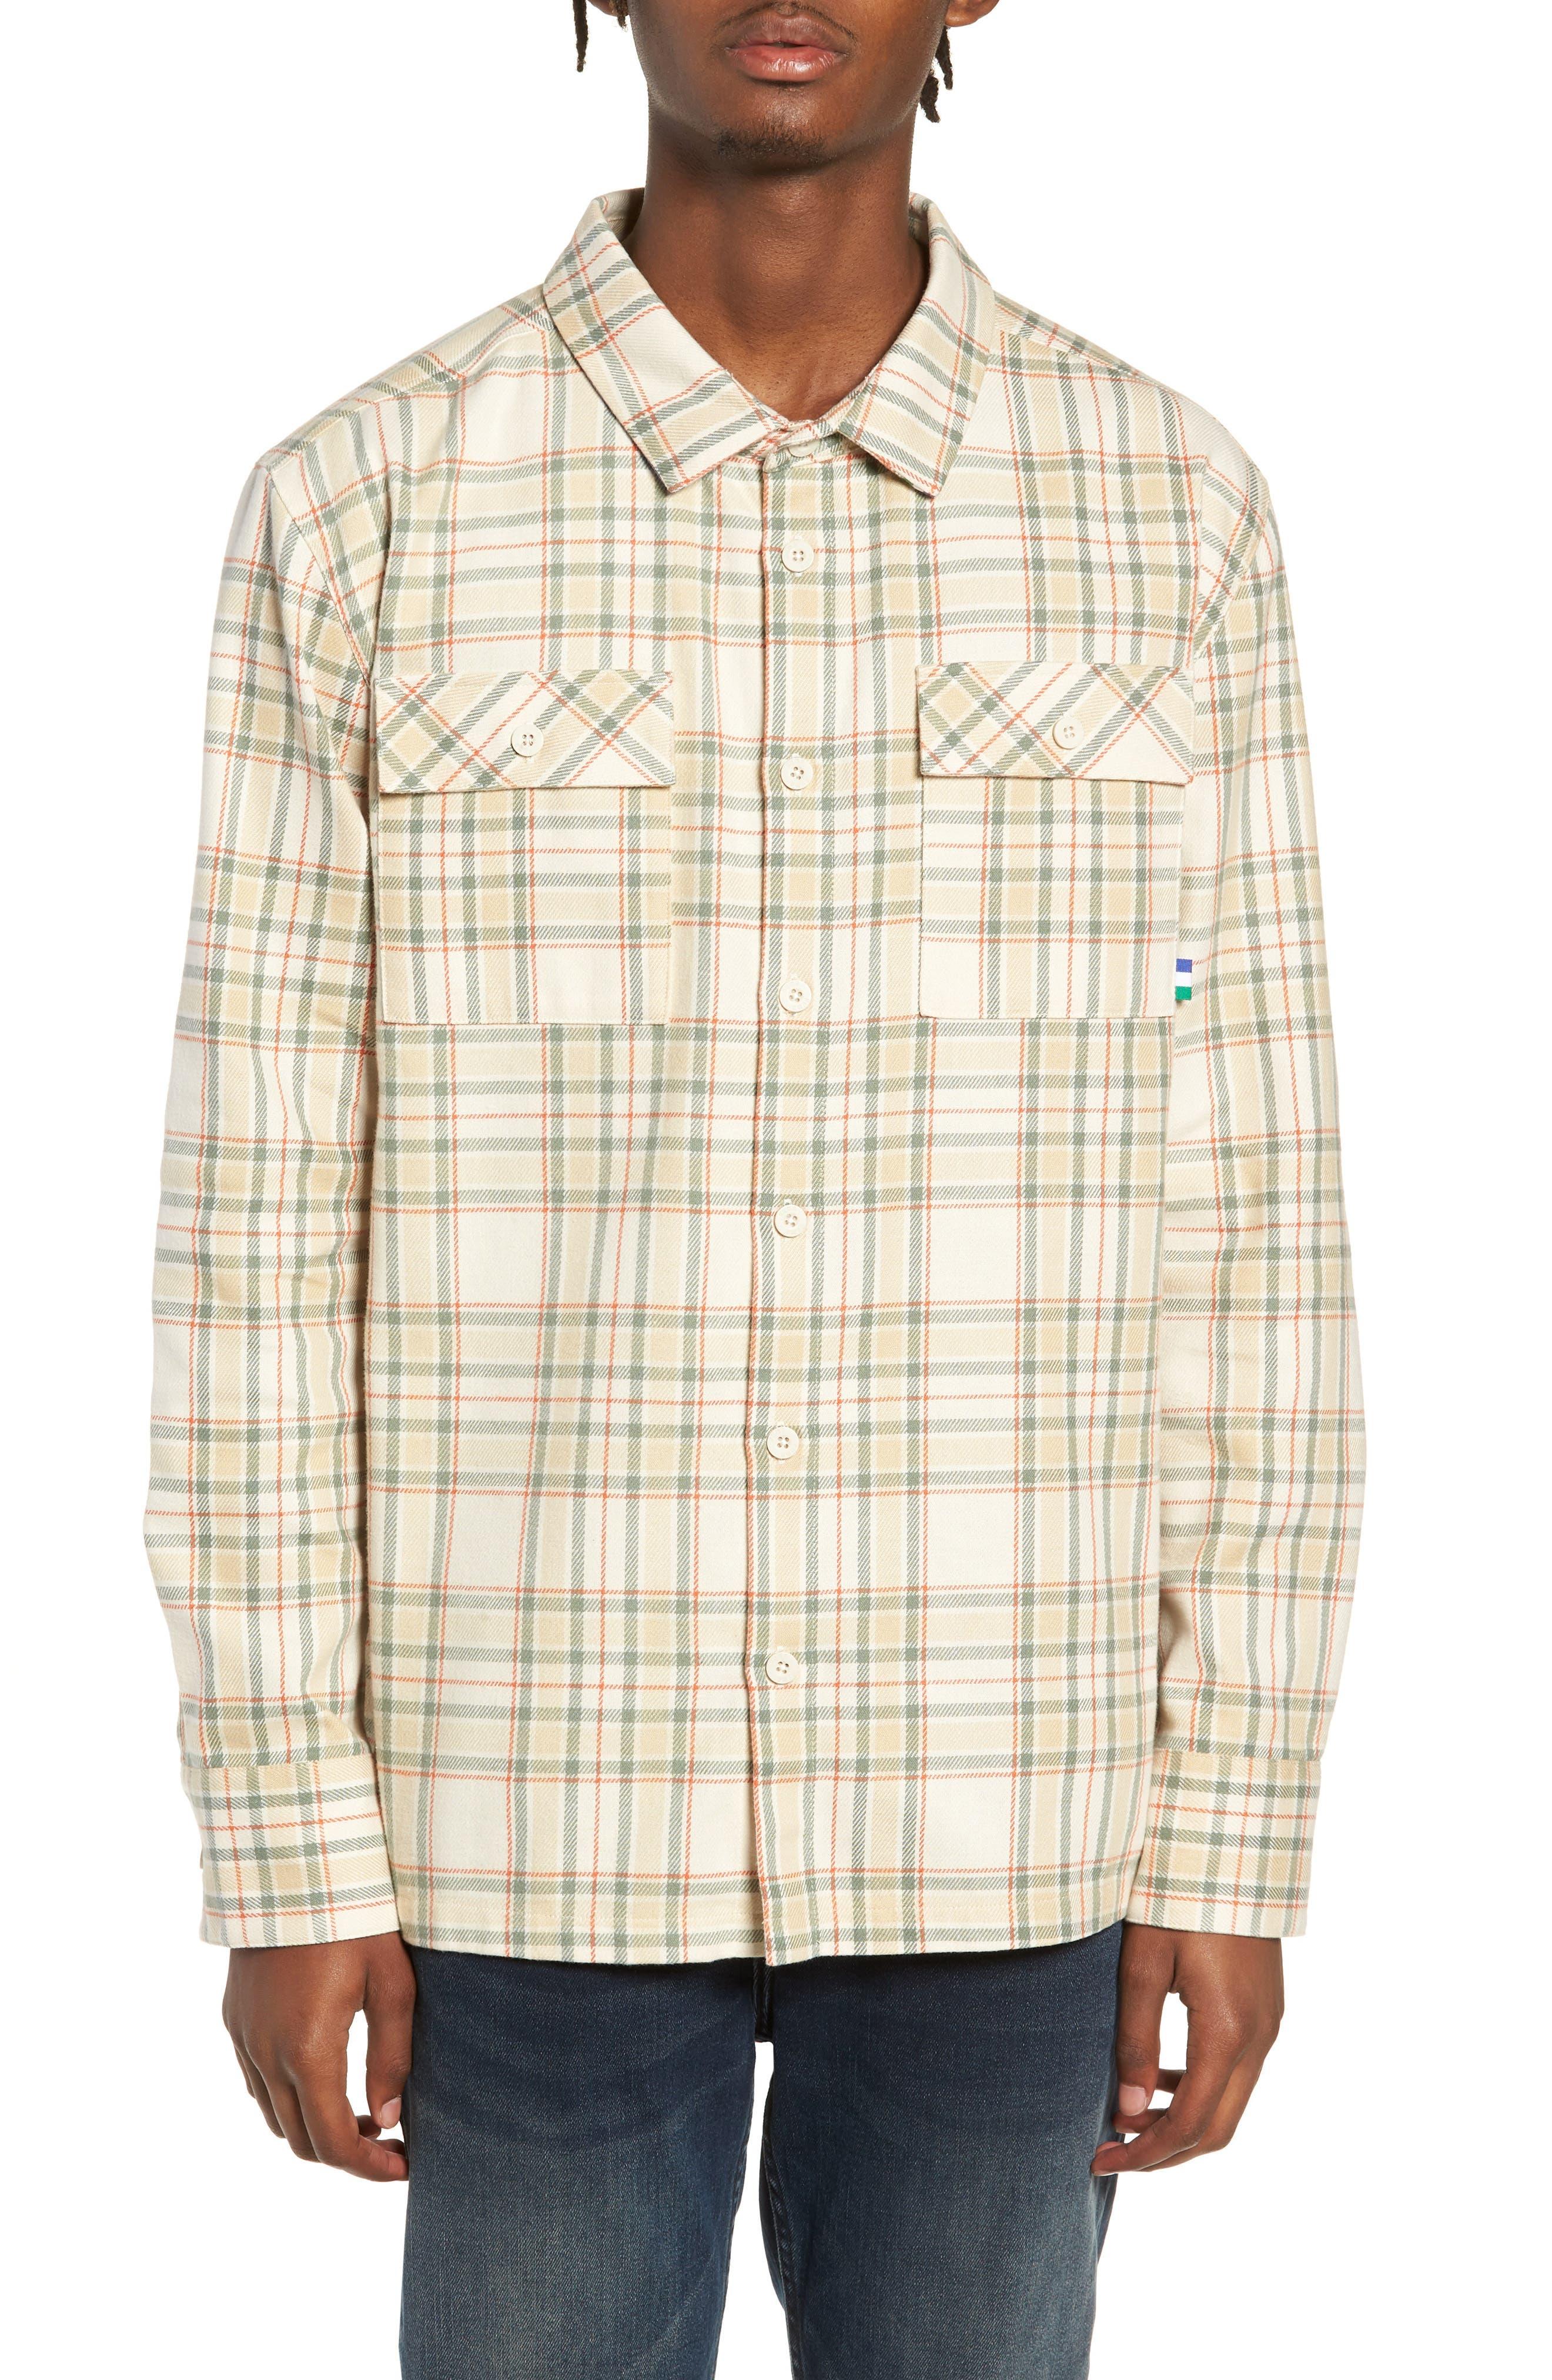 PUMA x Big Sean Check Shirt, Main, color, 100